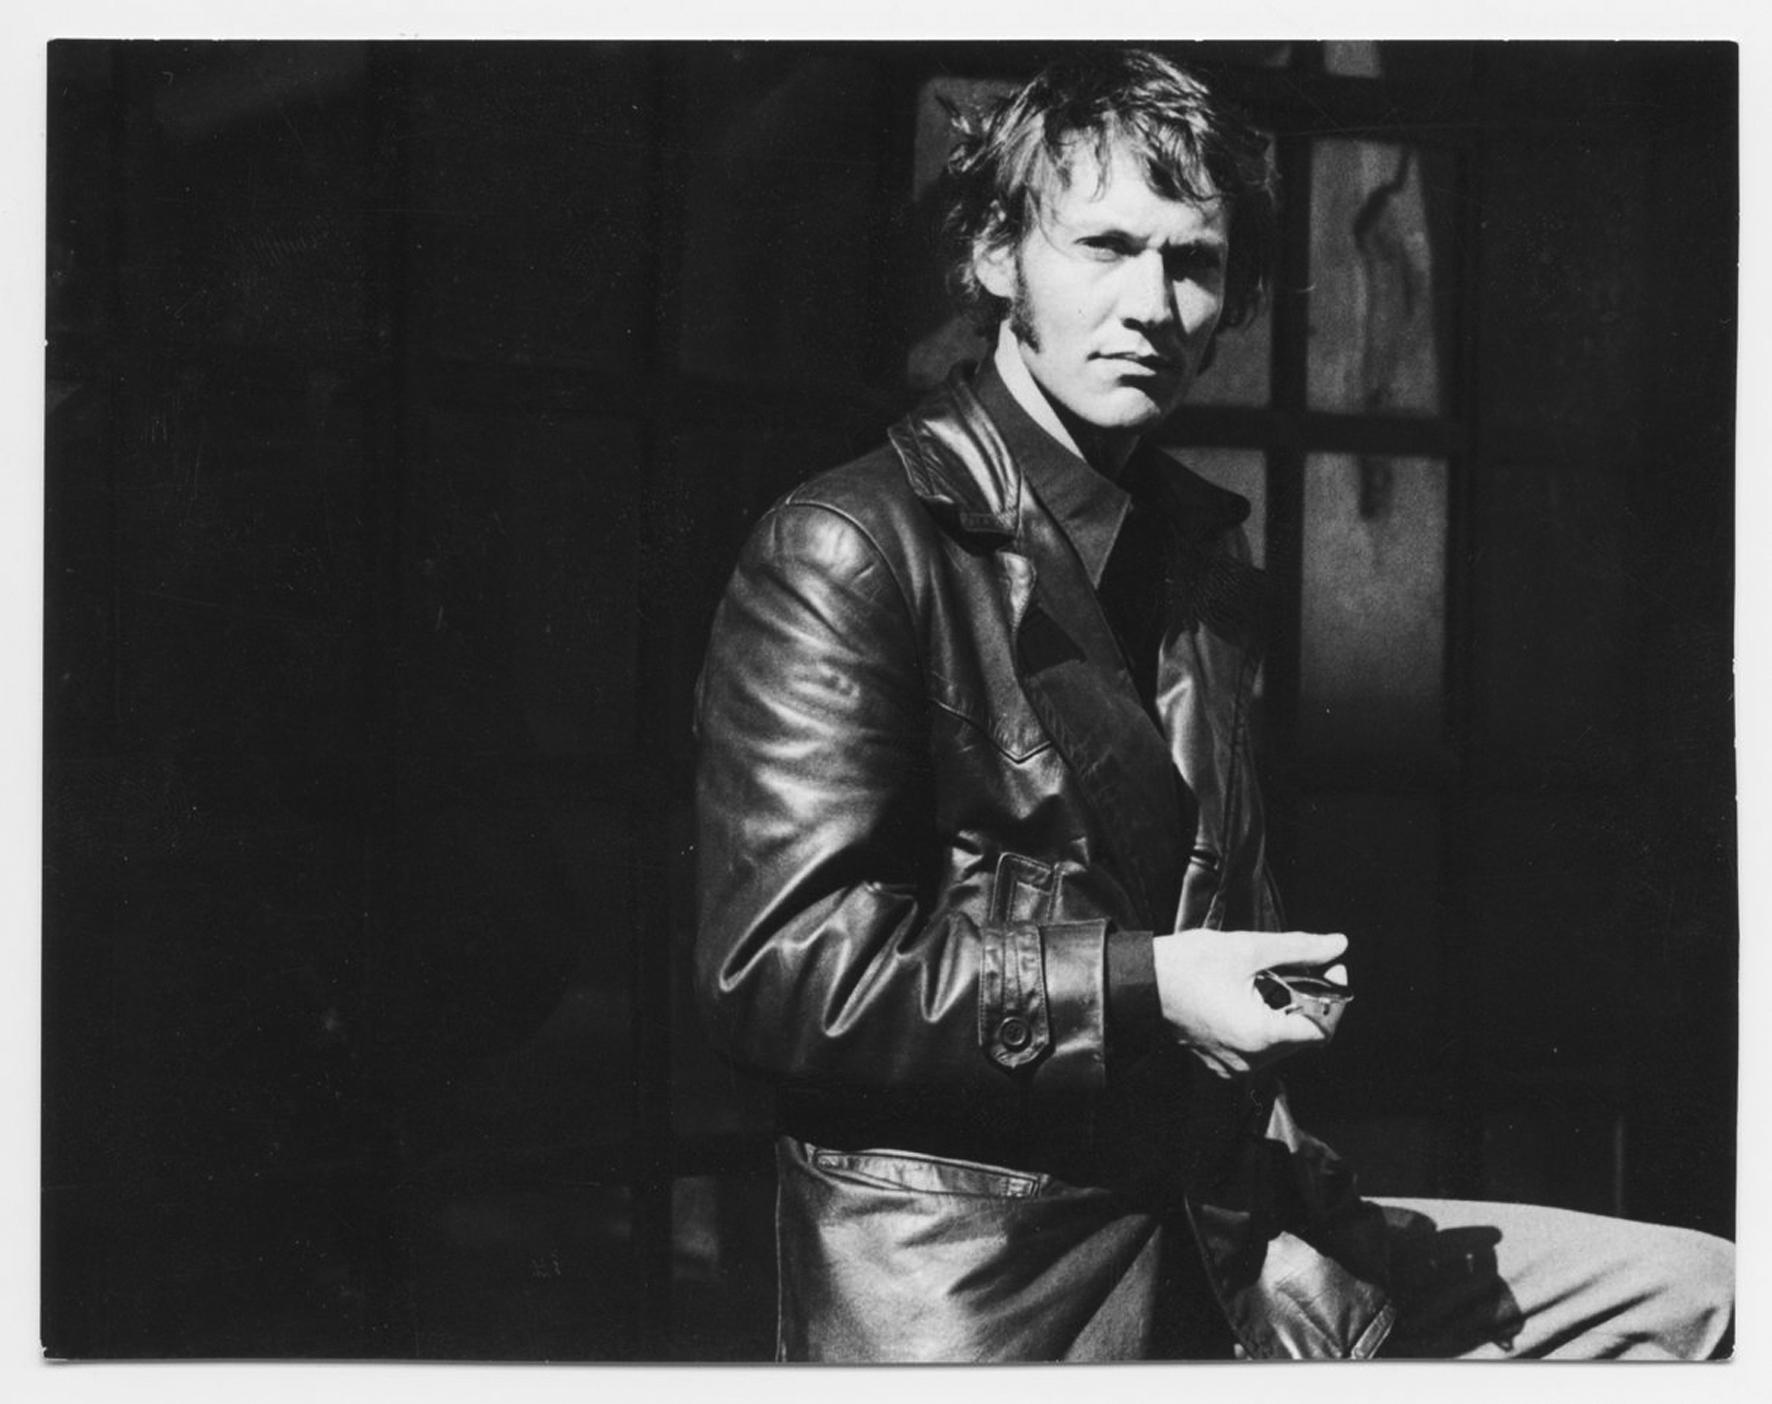 roland-klick-1969-filmgalerie-451